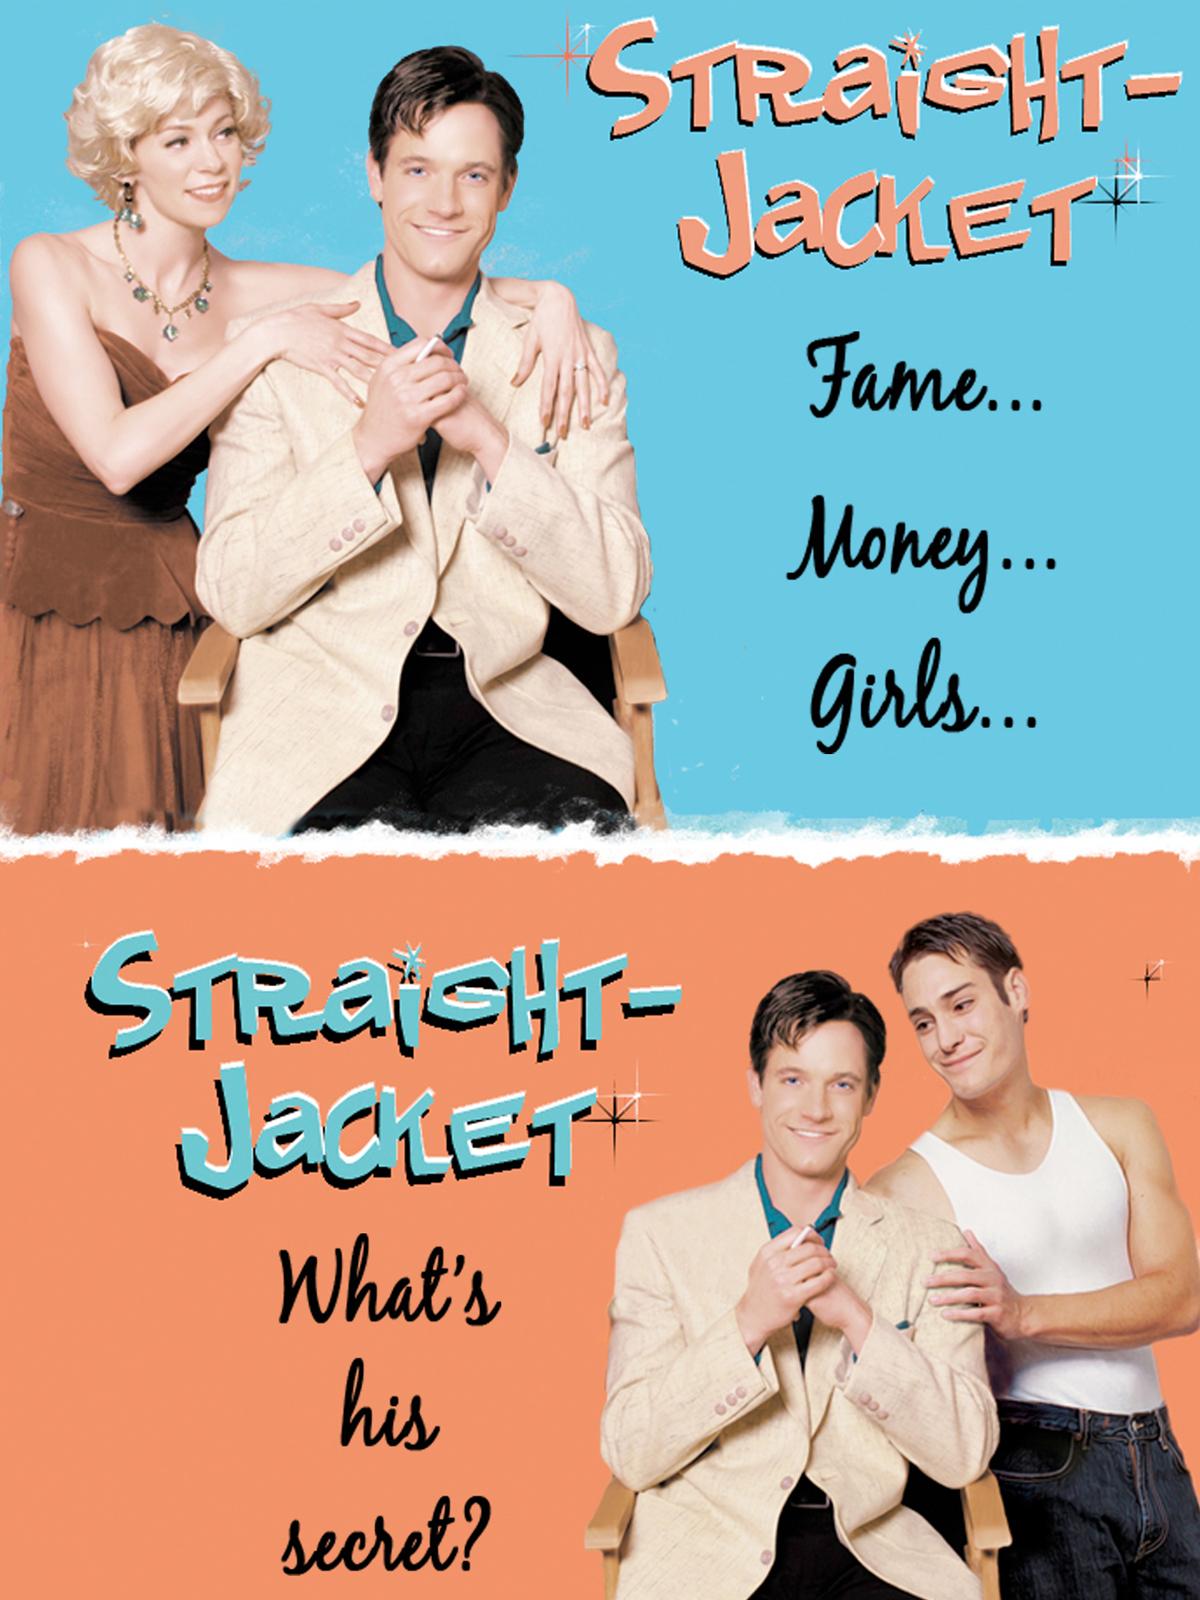 Here-StraightJacket-Full-Image-en-US.jpg